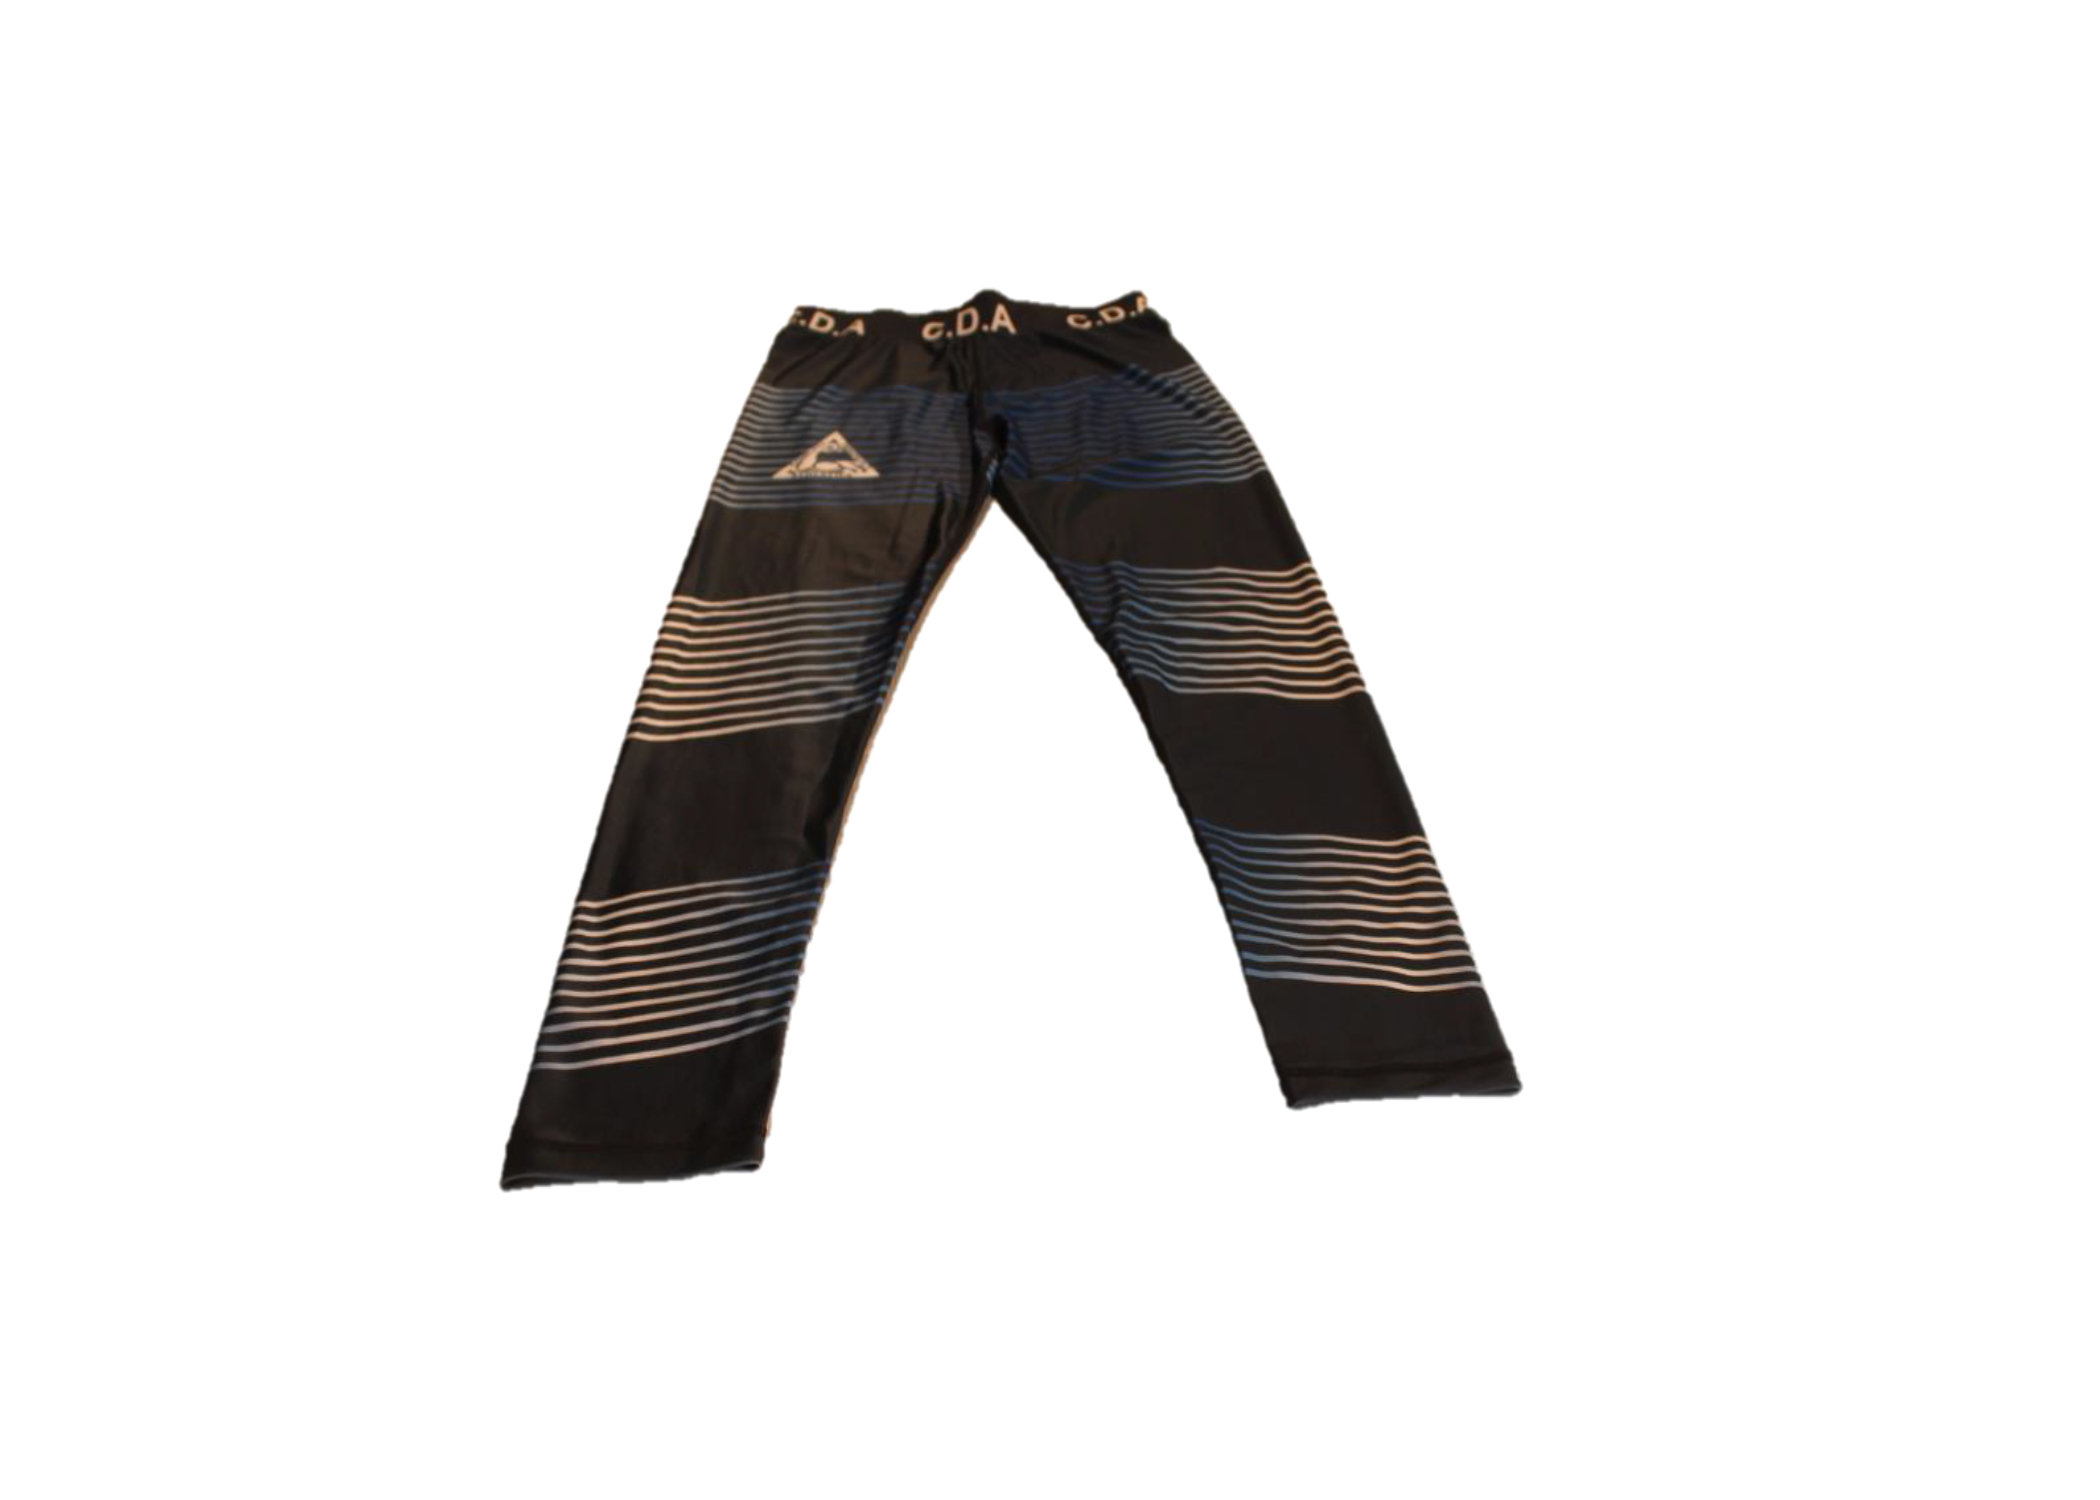 CDA Blue and white striped leggings 00237